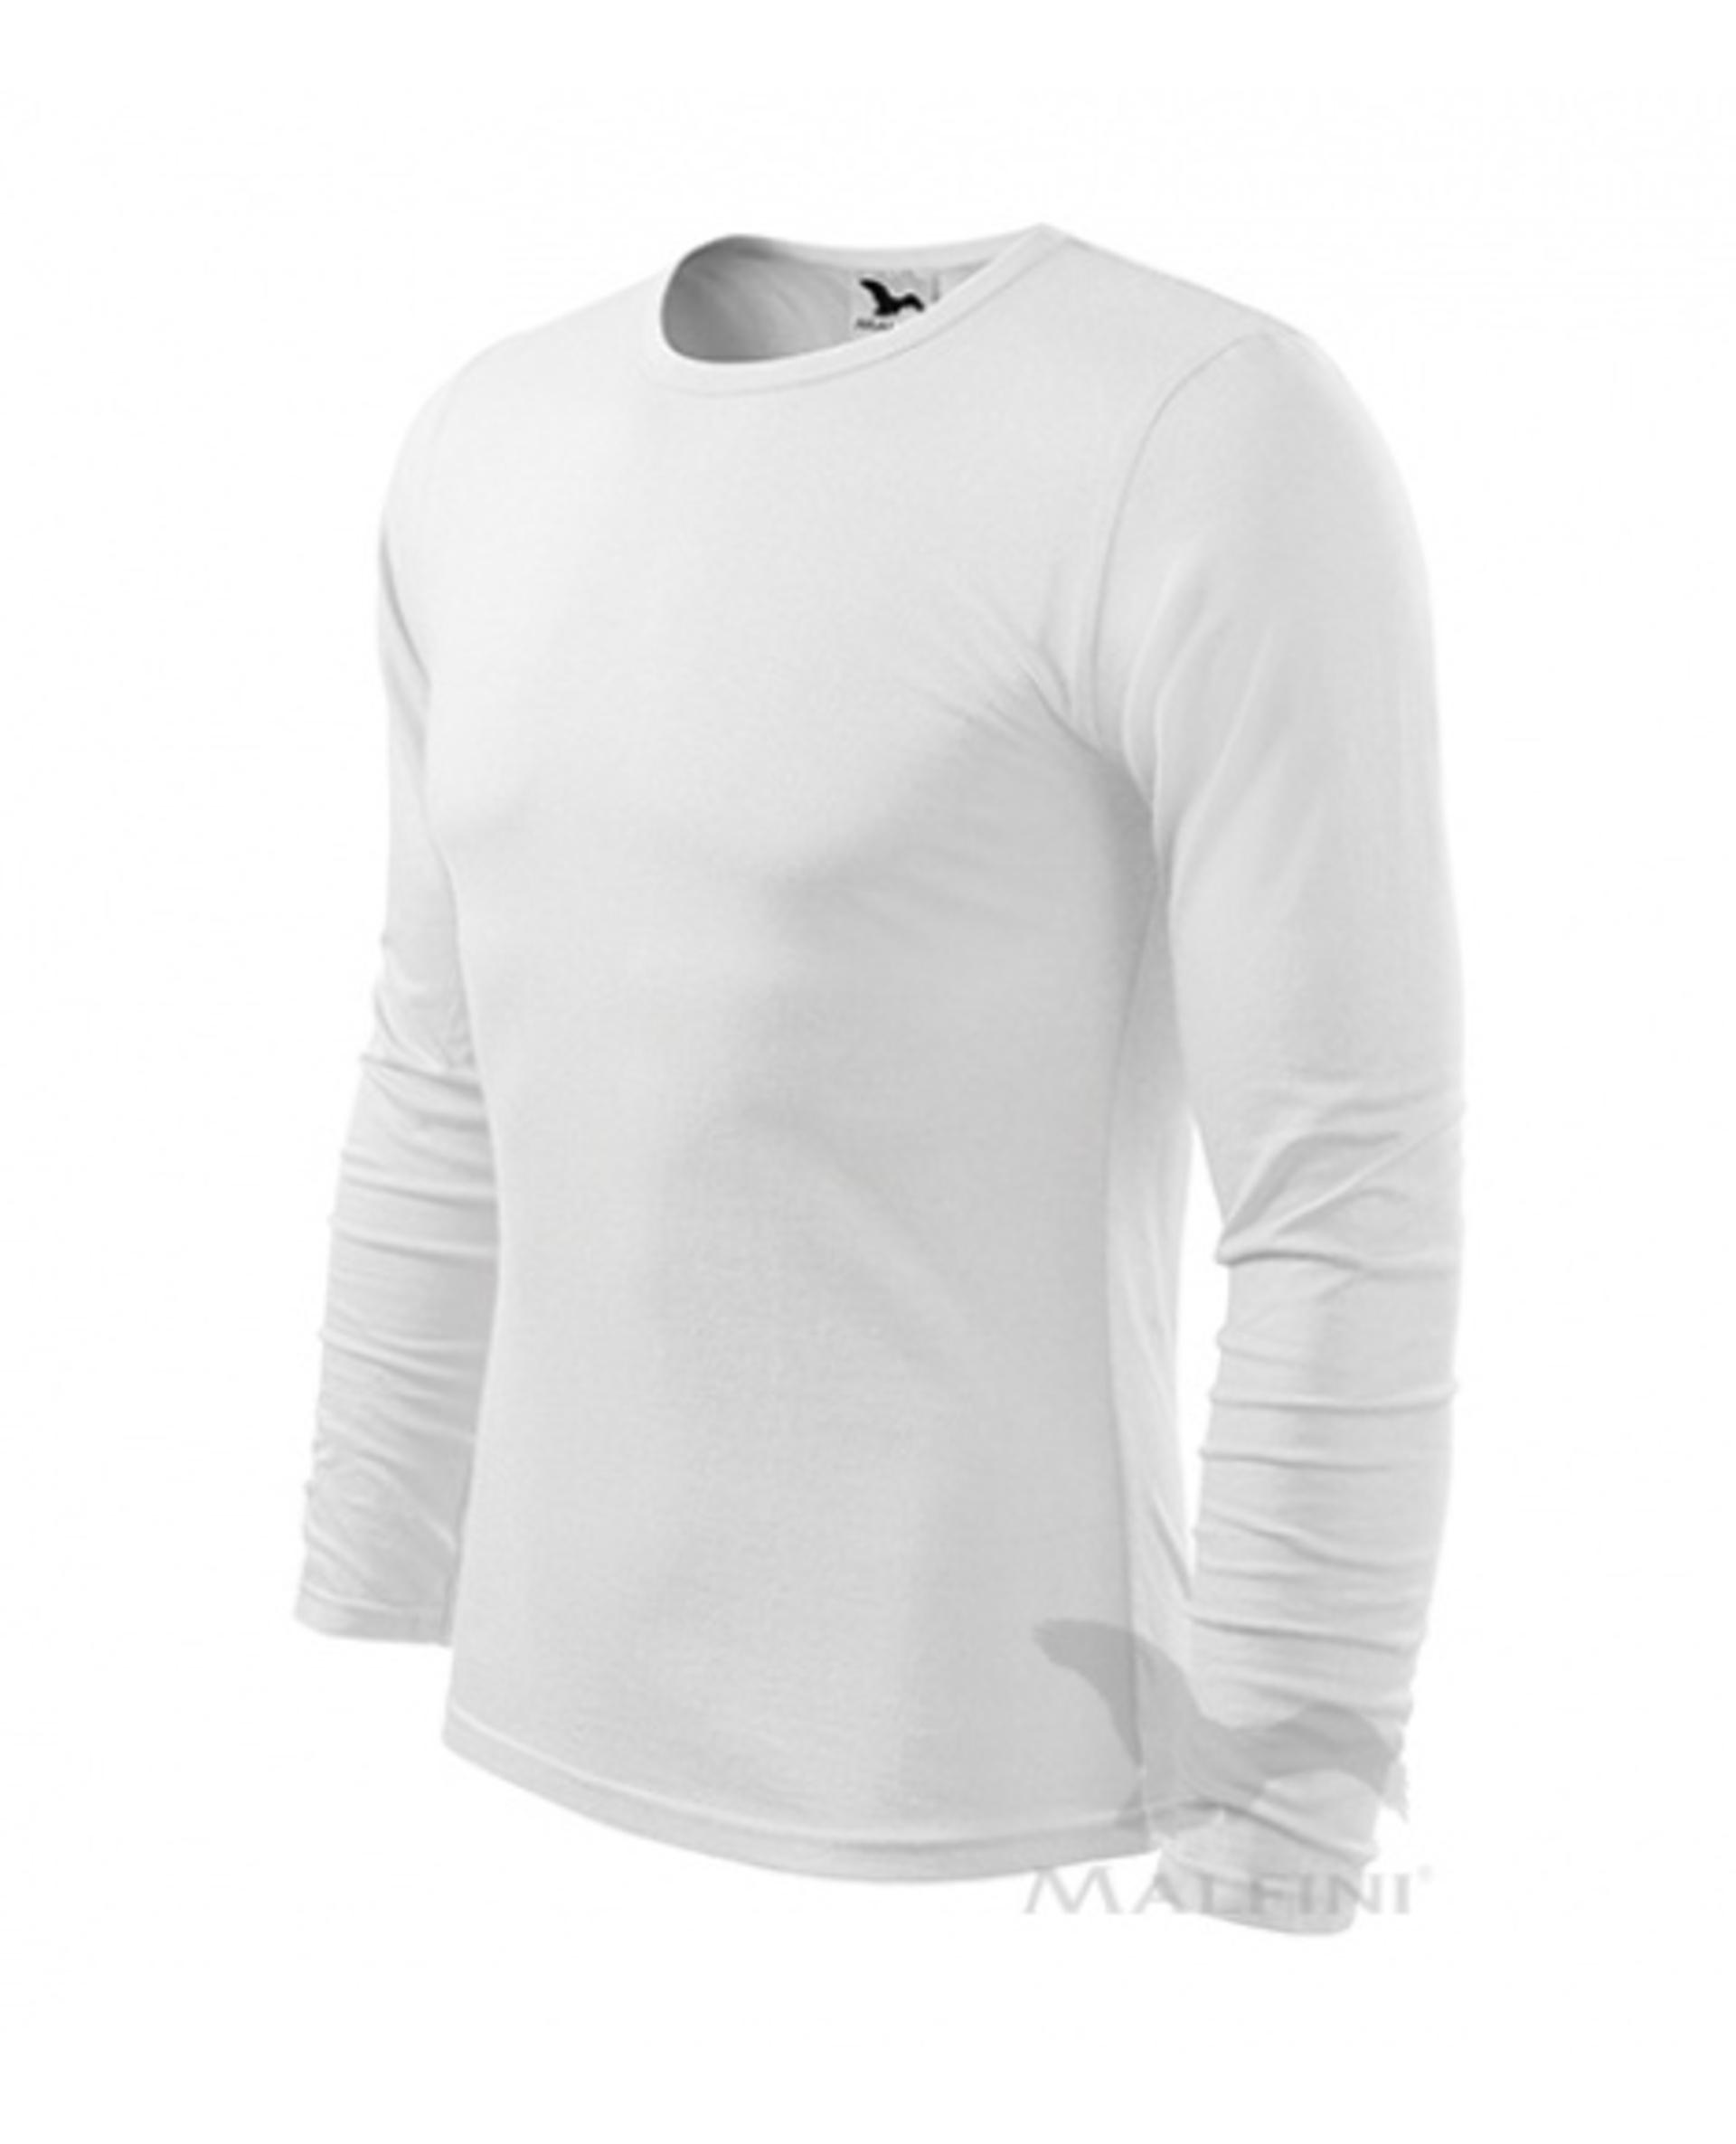 ADLER FIT-T LONG SLEEVE pánské dlouhý rukáv Tričko bílá XL